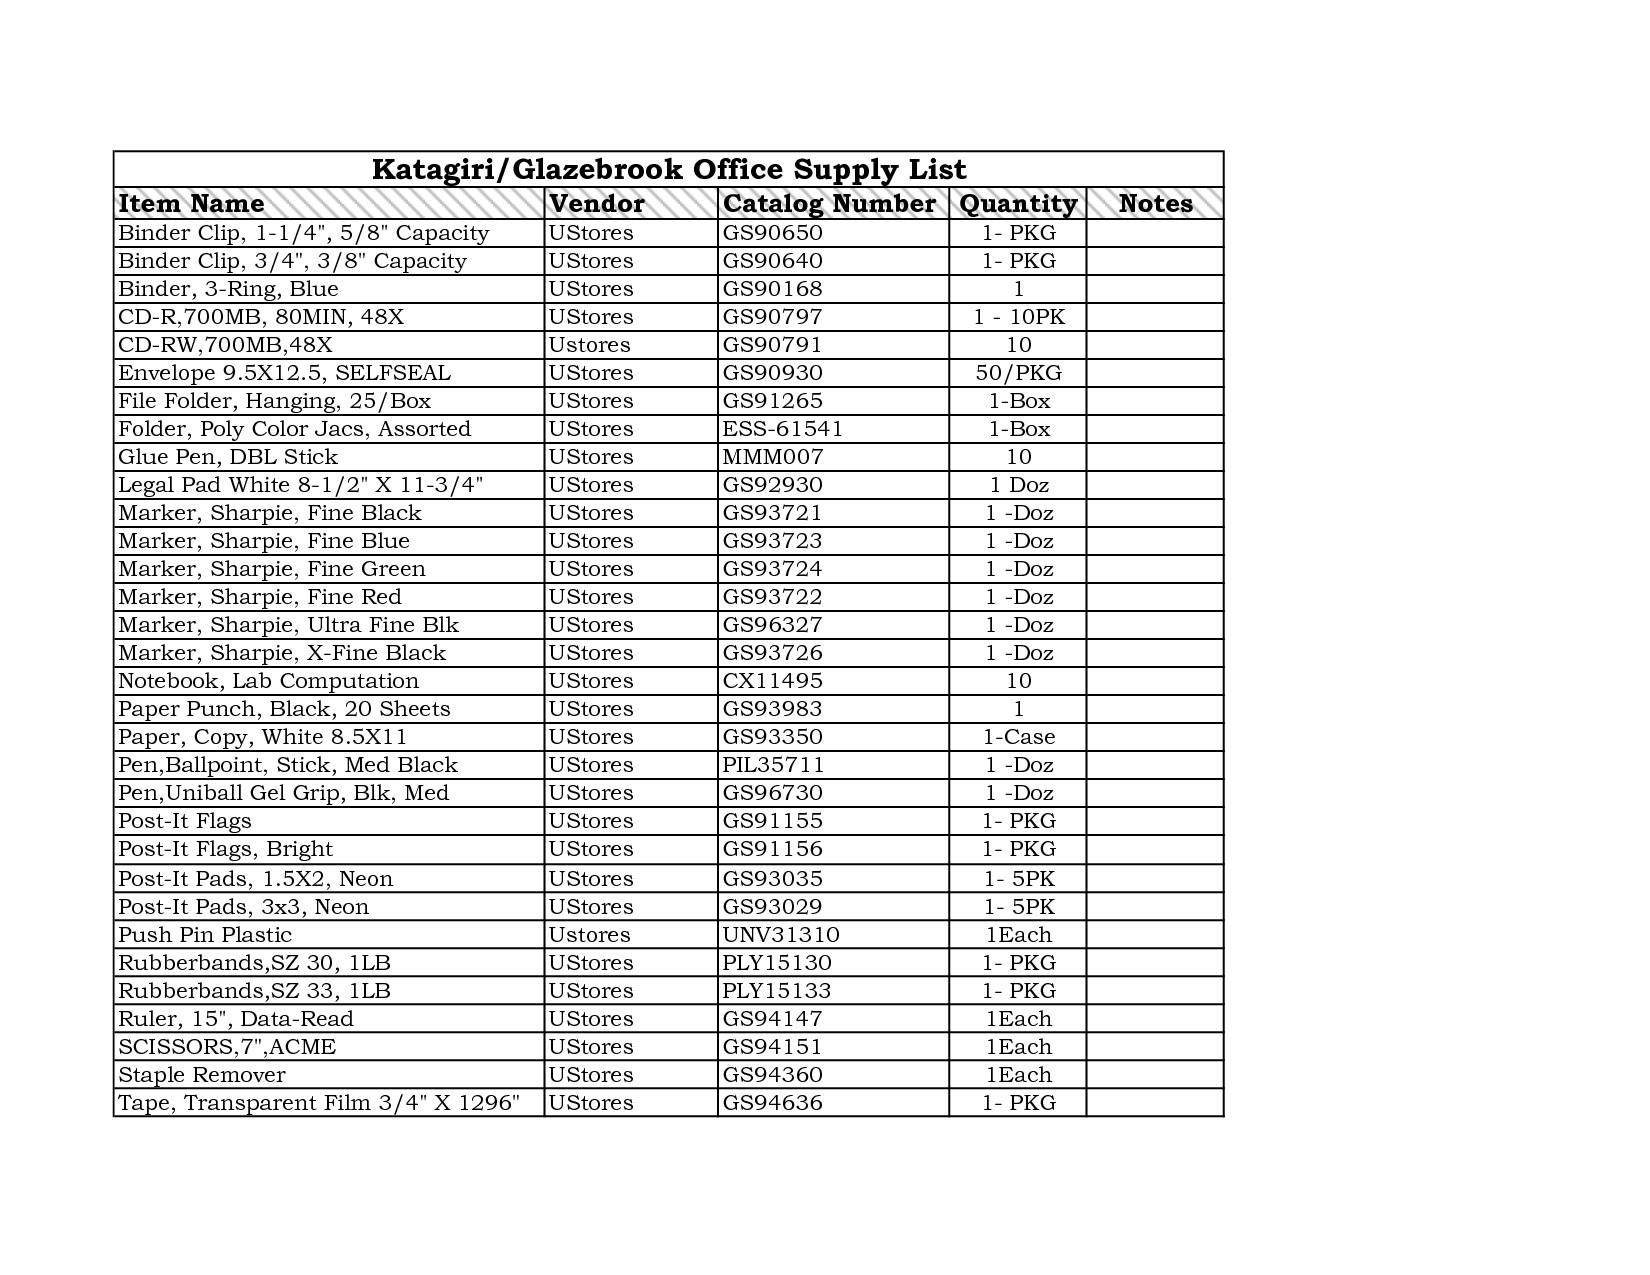 Office Supplies Inventory Spreadsheet – Ebnefsi.eu Together With Office Supply Inventory Spreadsheet